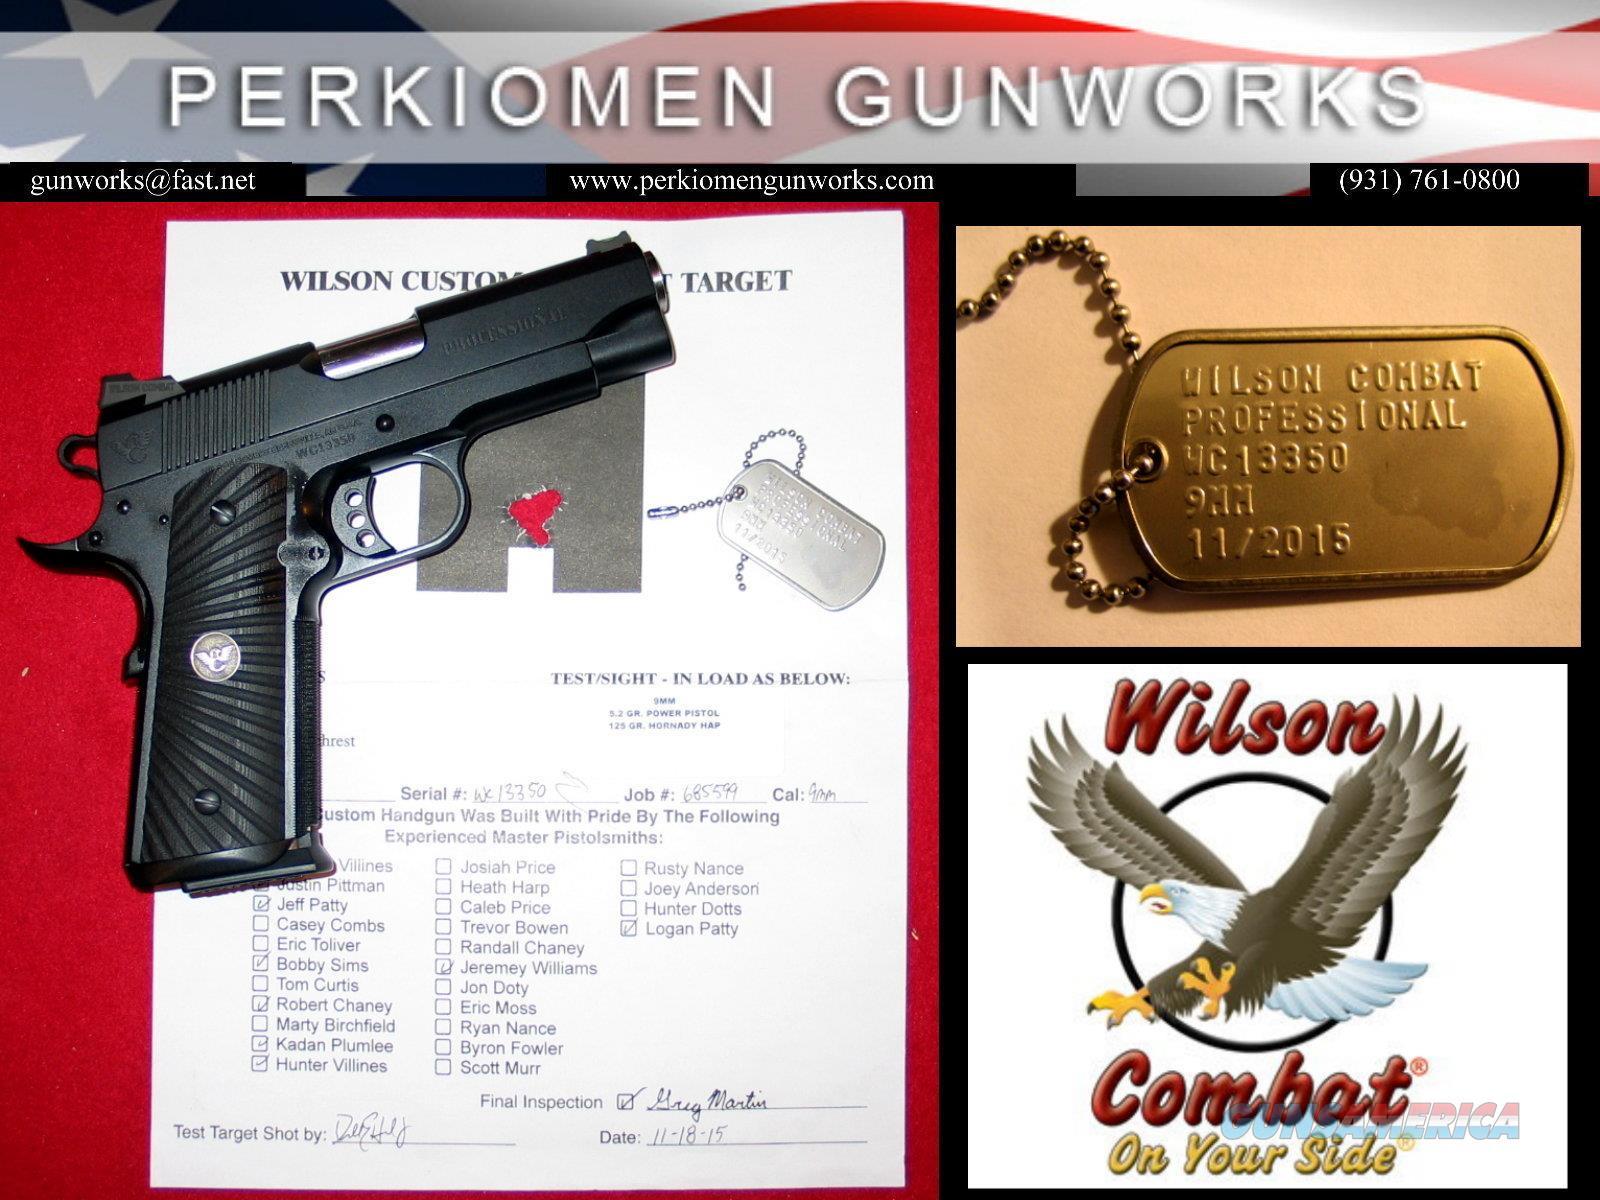 Professional 9mm, 4' w/options - New in Box  Guns > Pistols > Wilson Combat Pistols